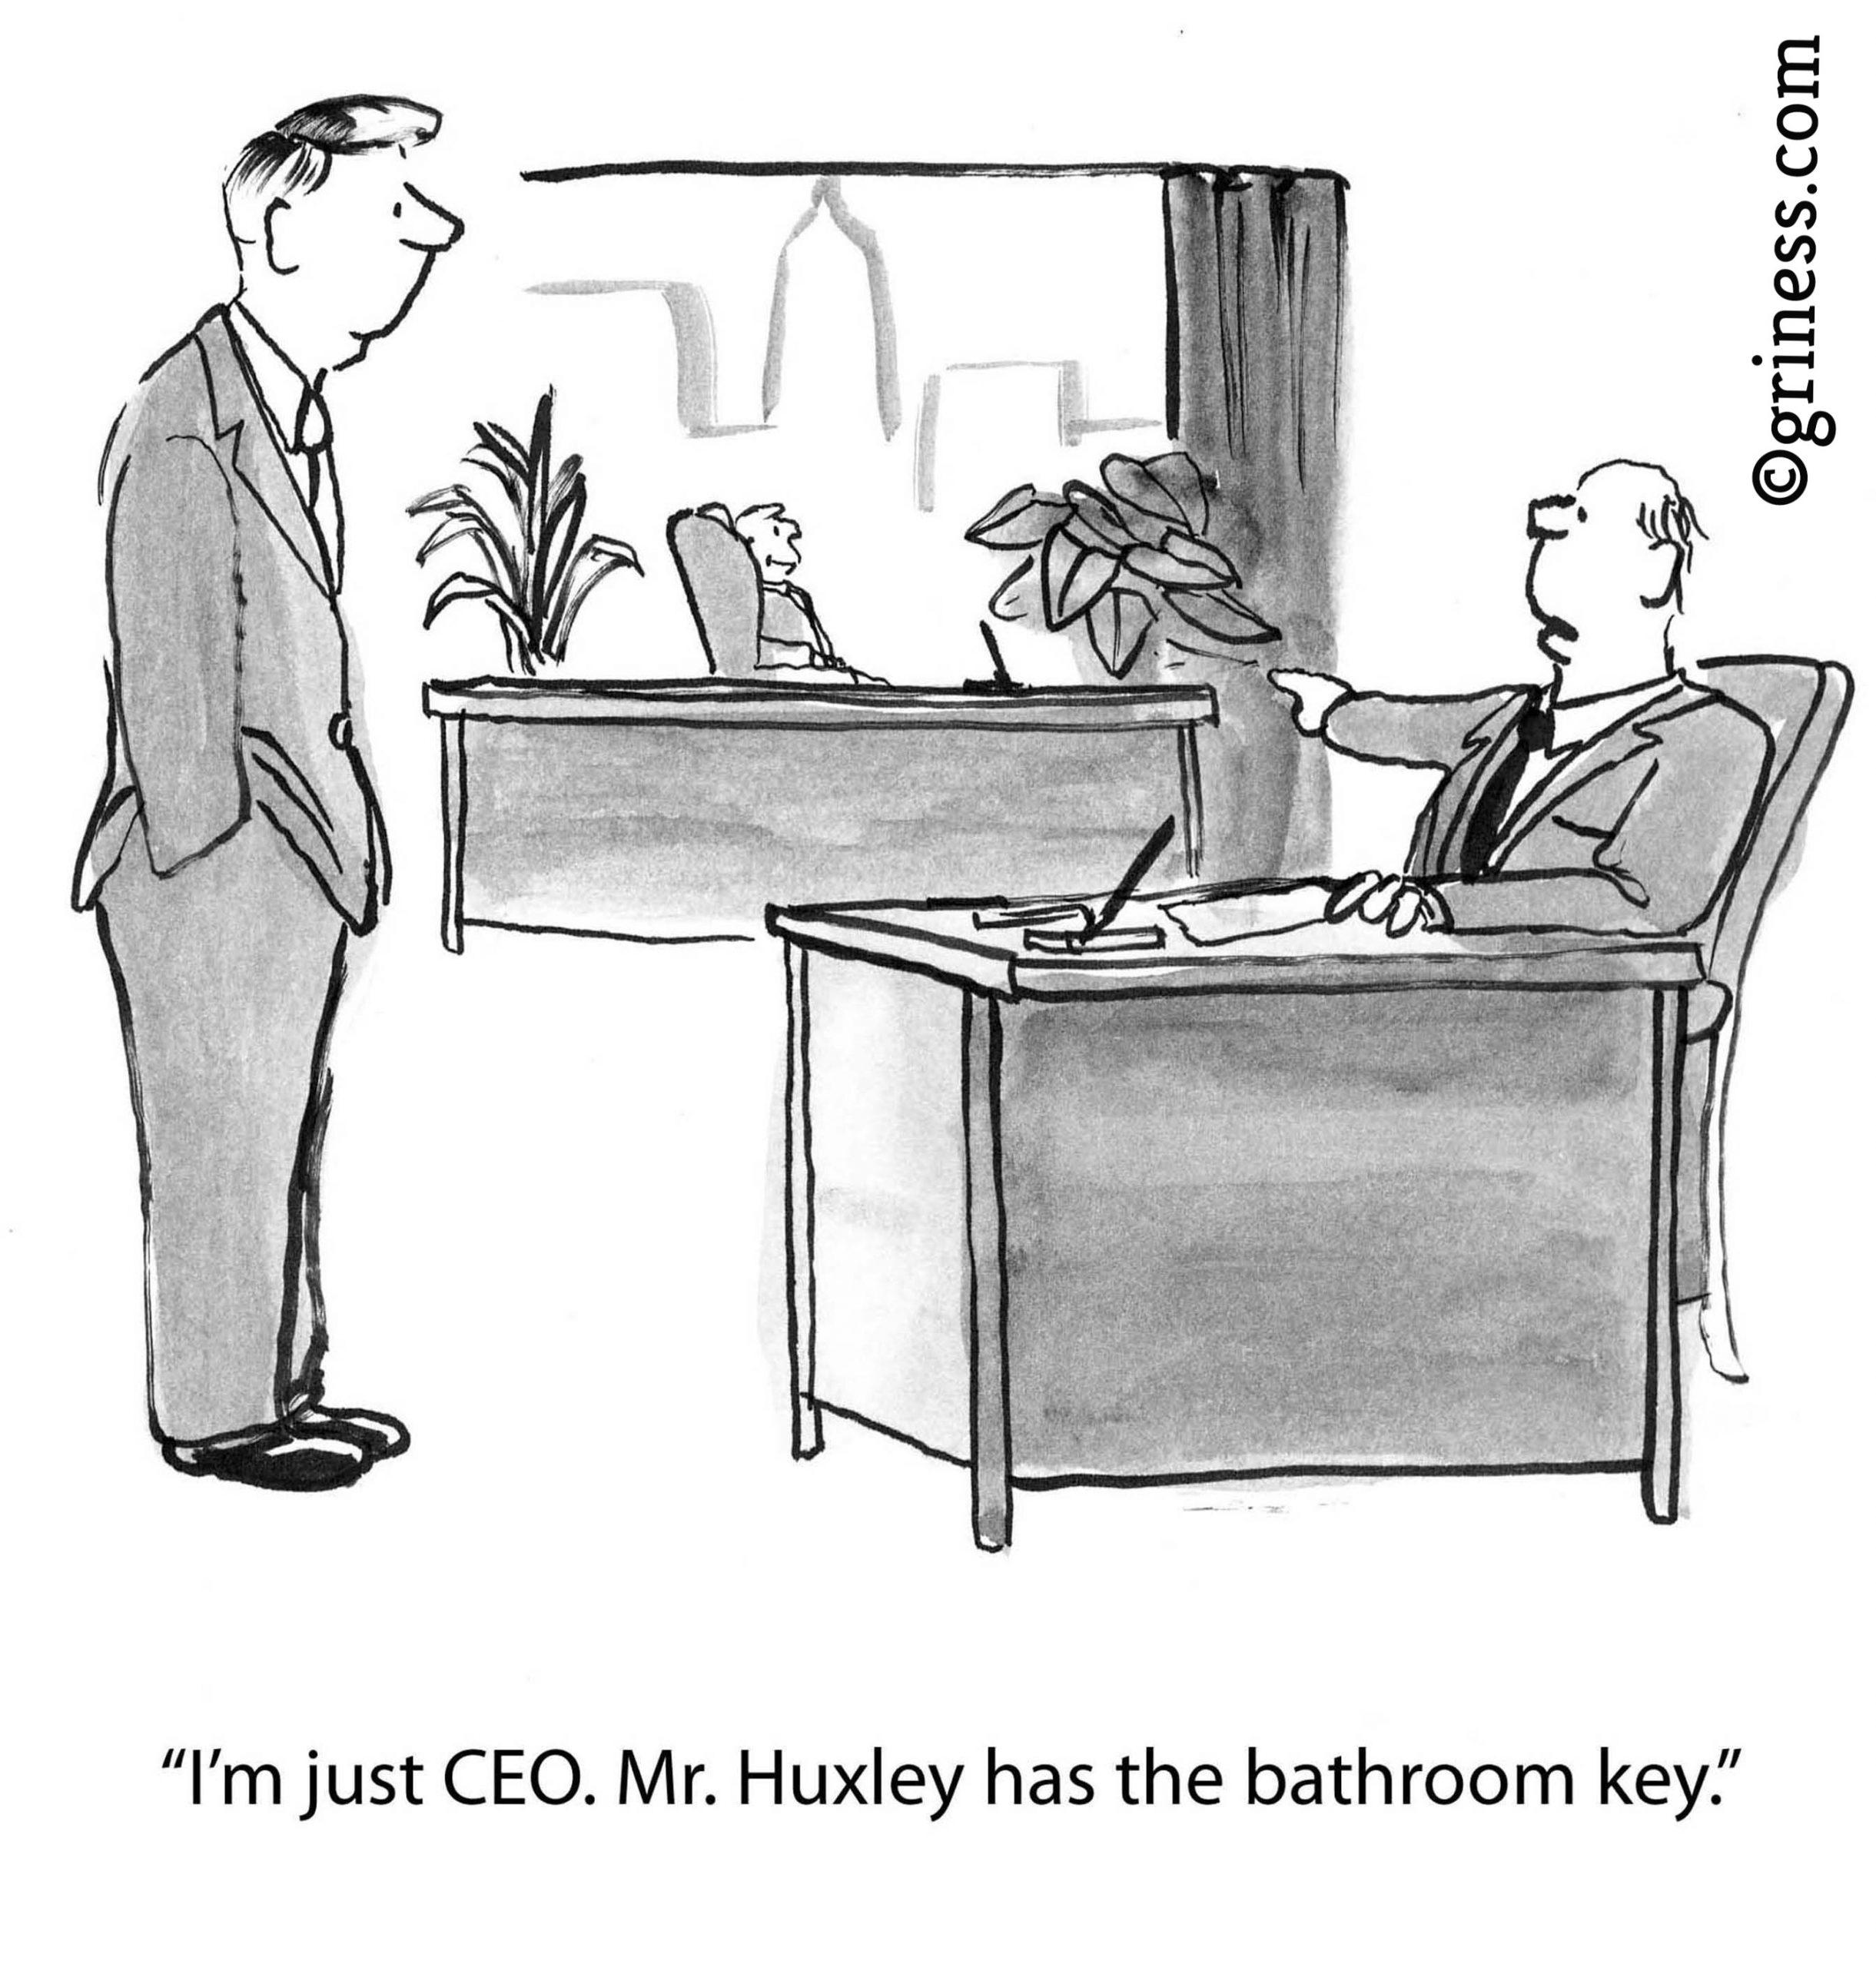 i am just ceo. mr huxley has the bathroom key 02 Feb 2020 business cartoon